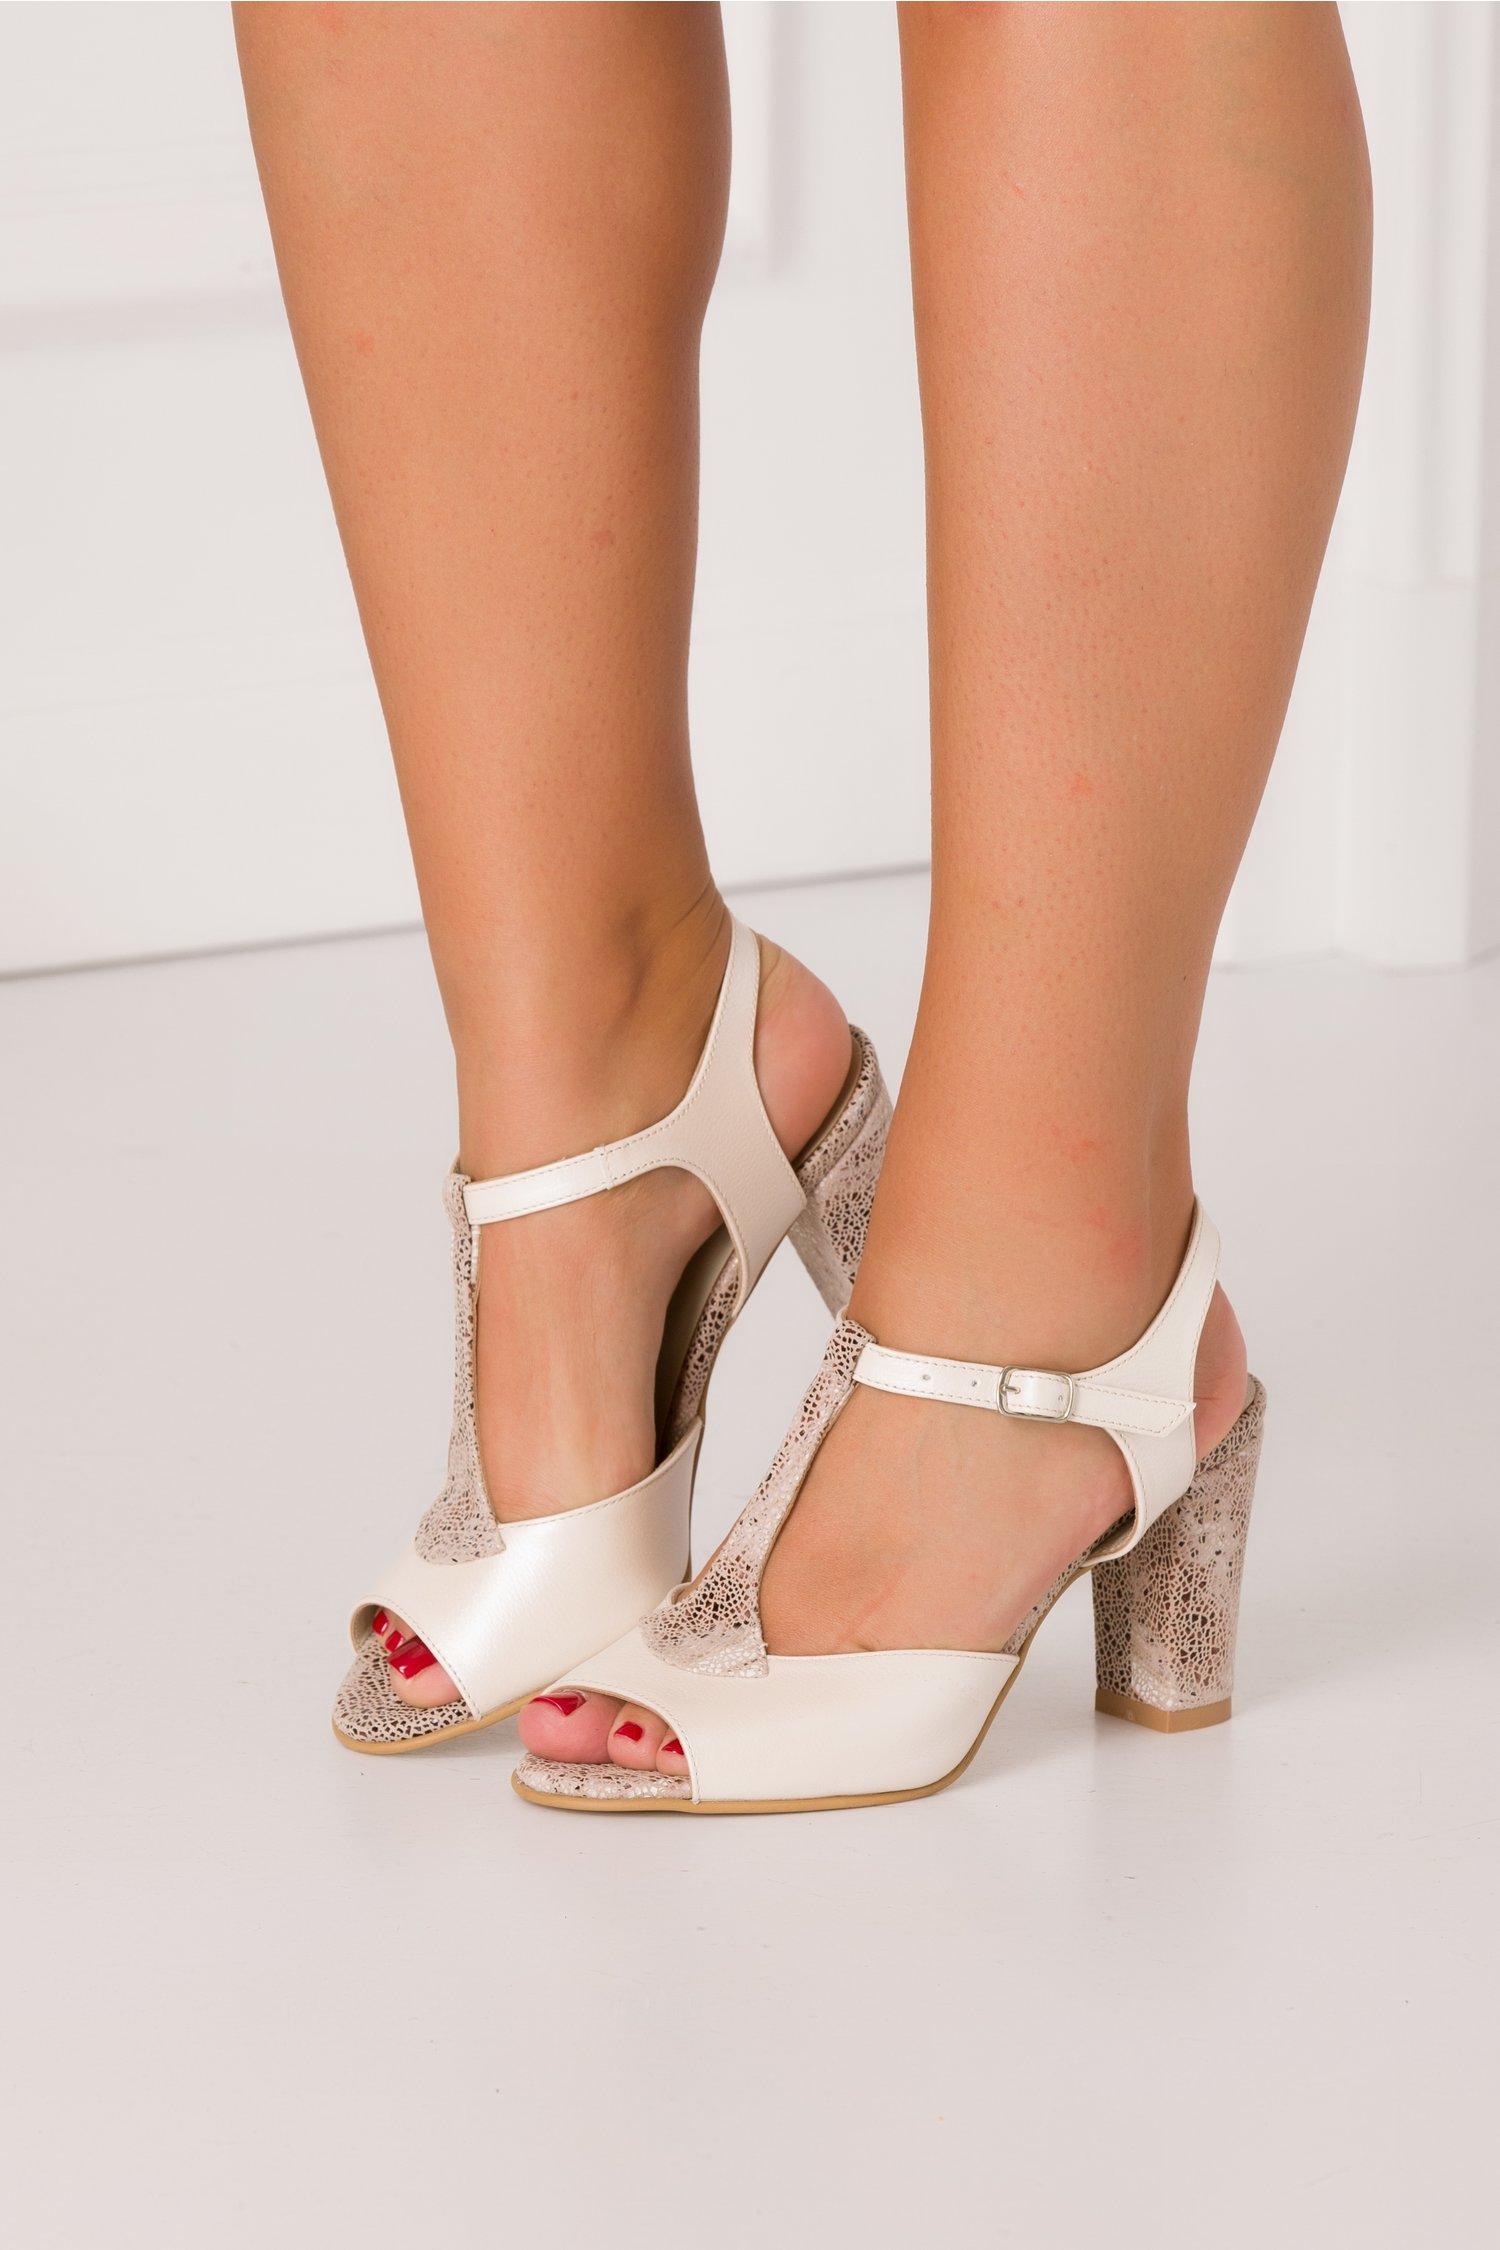 Sandale crem sidefat cu insertii tip plasa